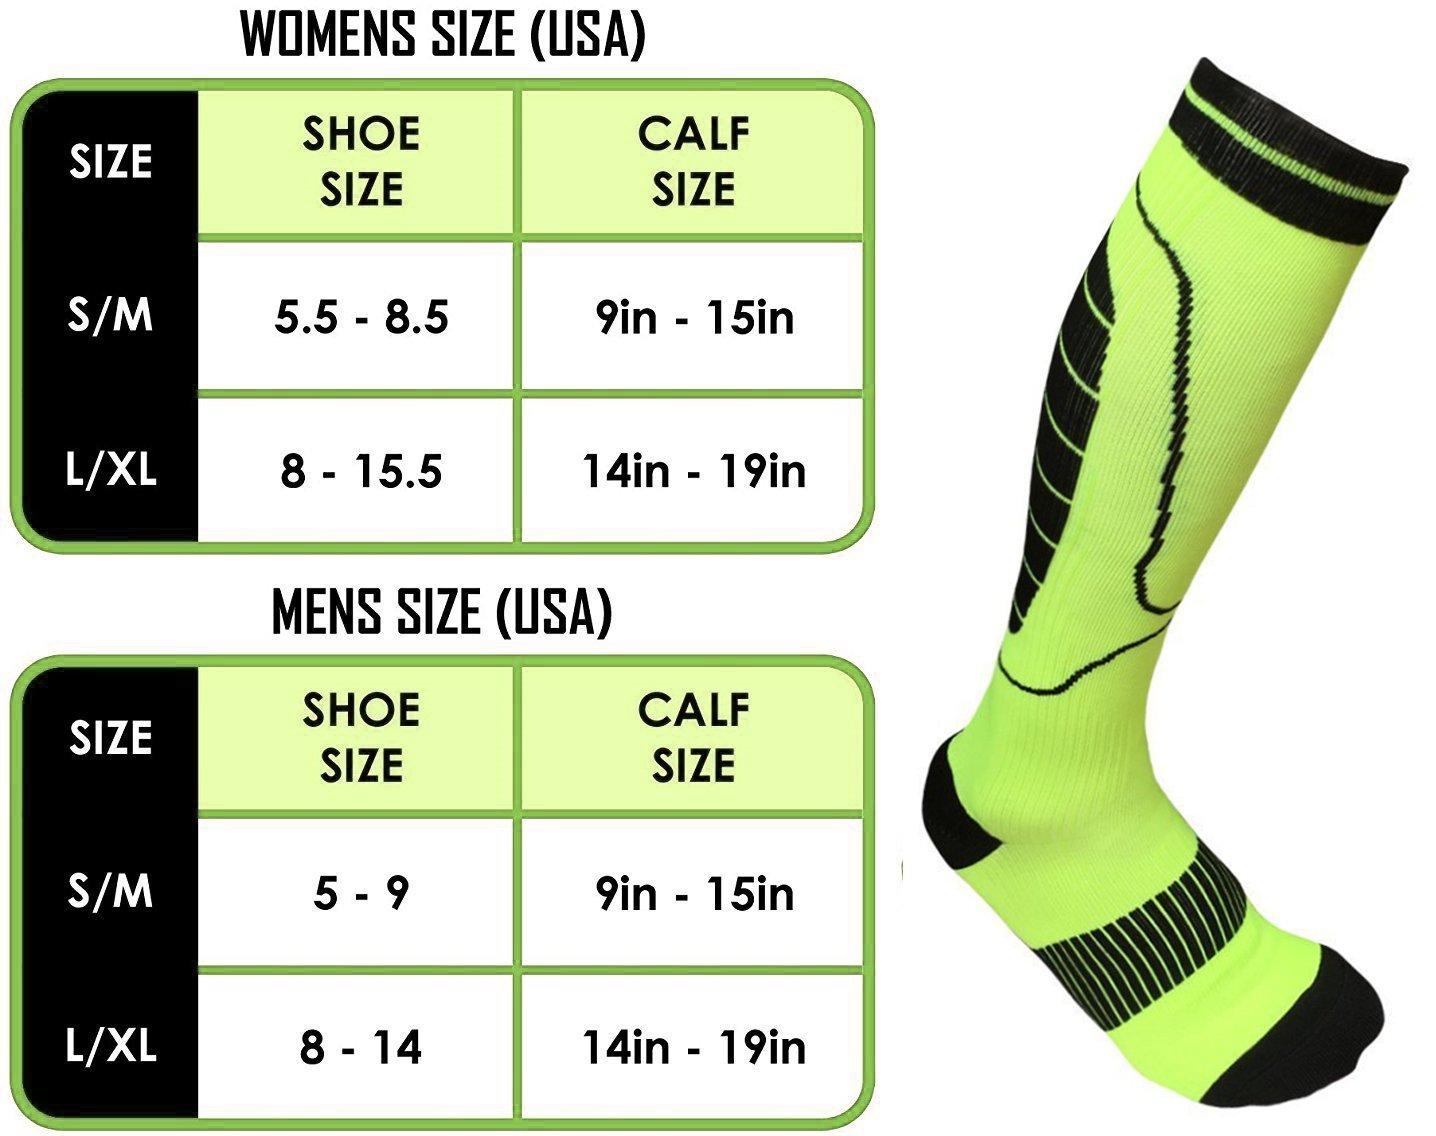 Compression Socks Men and Women, Qhui Graduated Athletic Sport Socks for Running, Medical, Nursing, Athletic, Crossfit, Flight Travel (Fluorescent green-M)